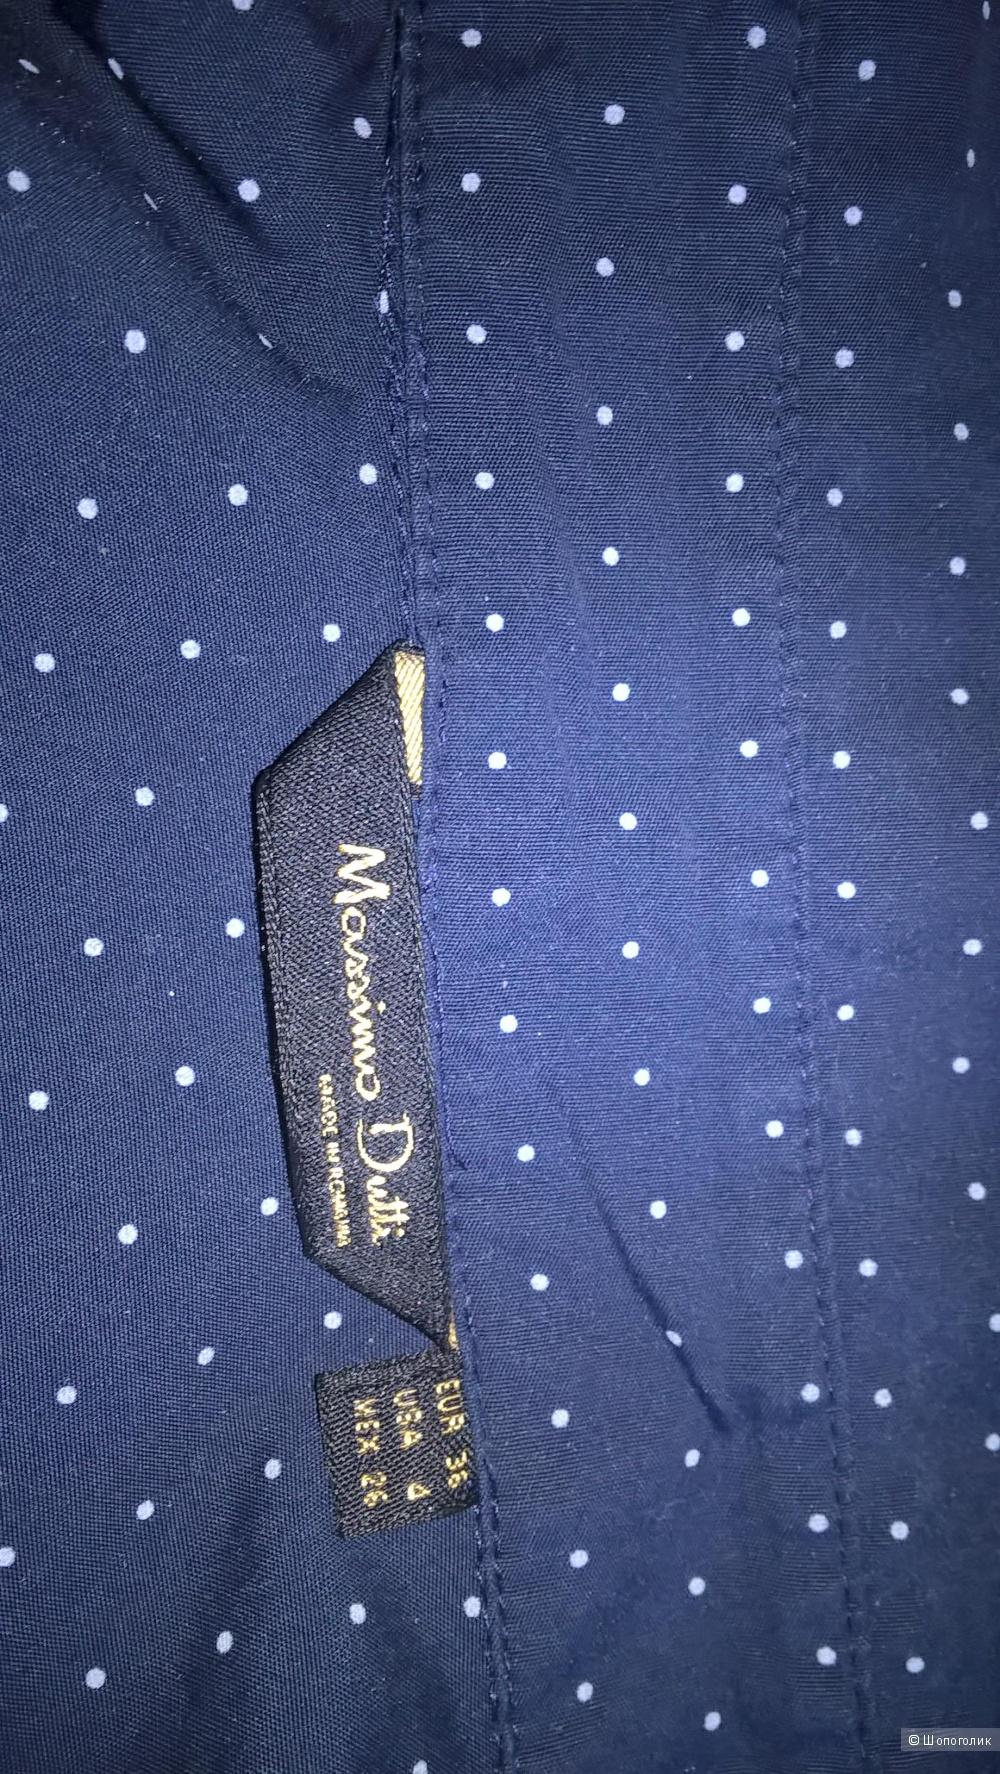 Рубашка Massimo Dutti, размер 36(42-44)